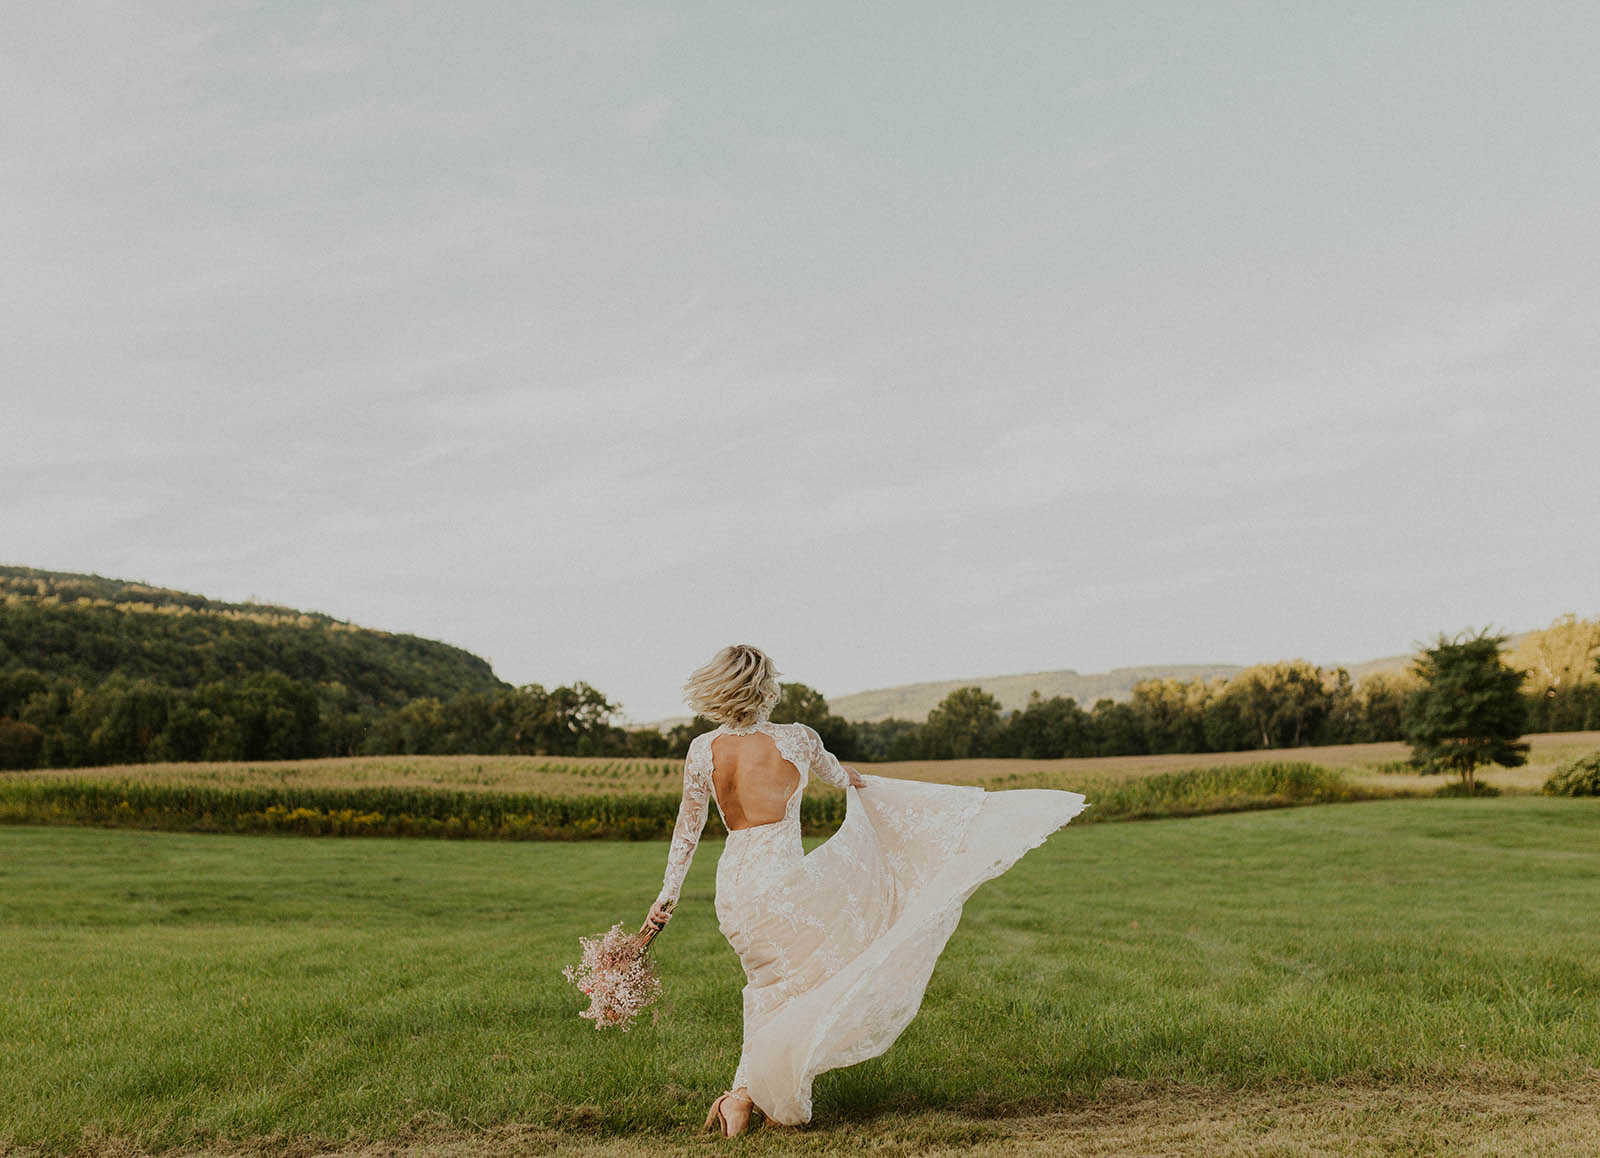 LostisFound Photography - Modern Feminine Lesbian Wedding - Dancing With Her